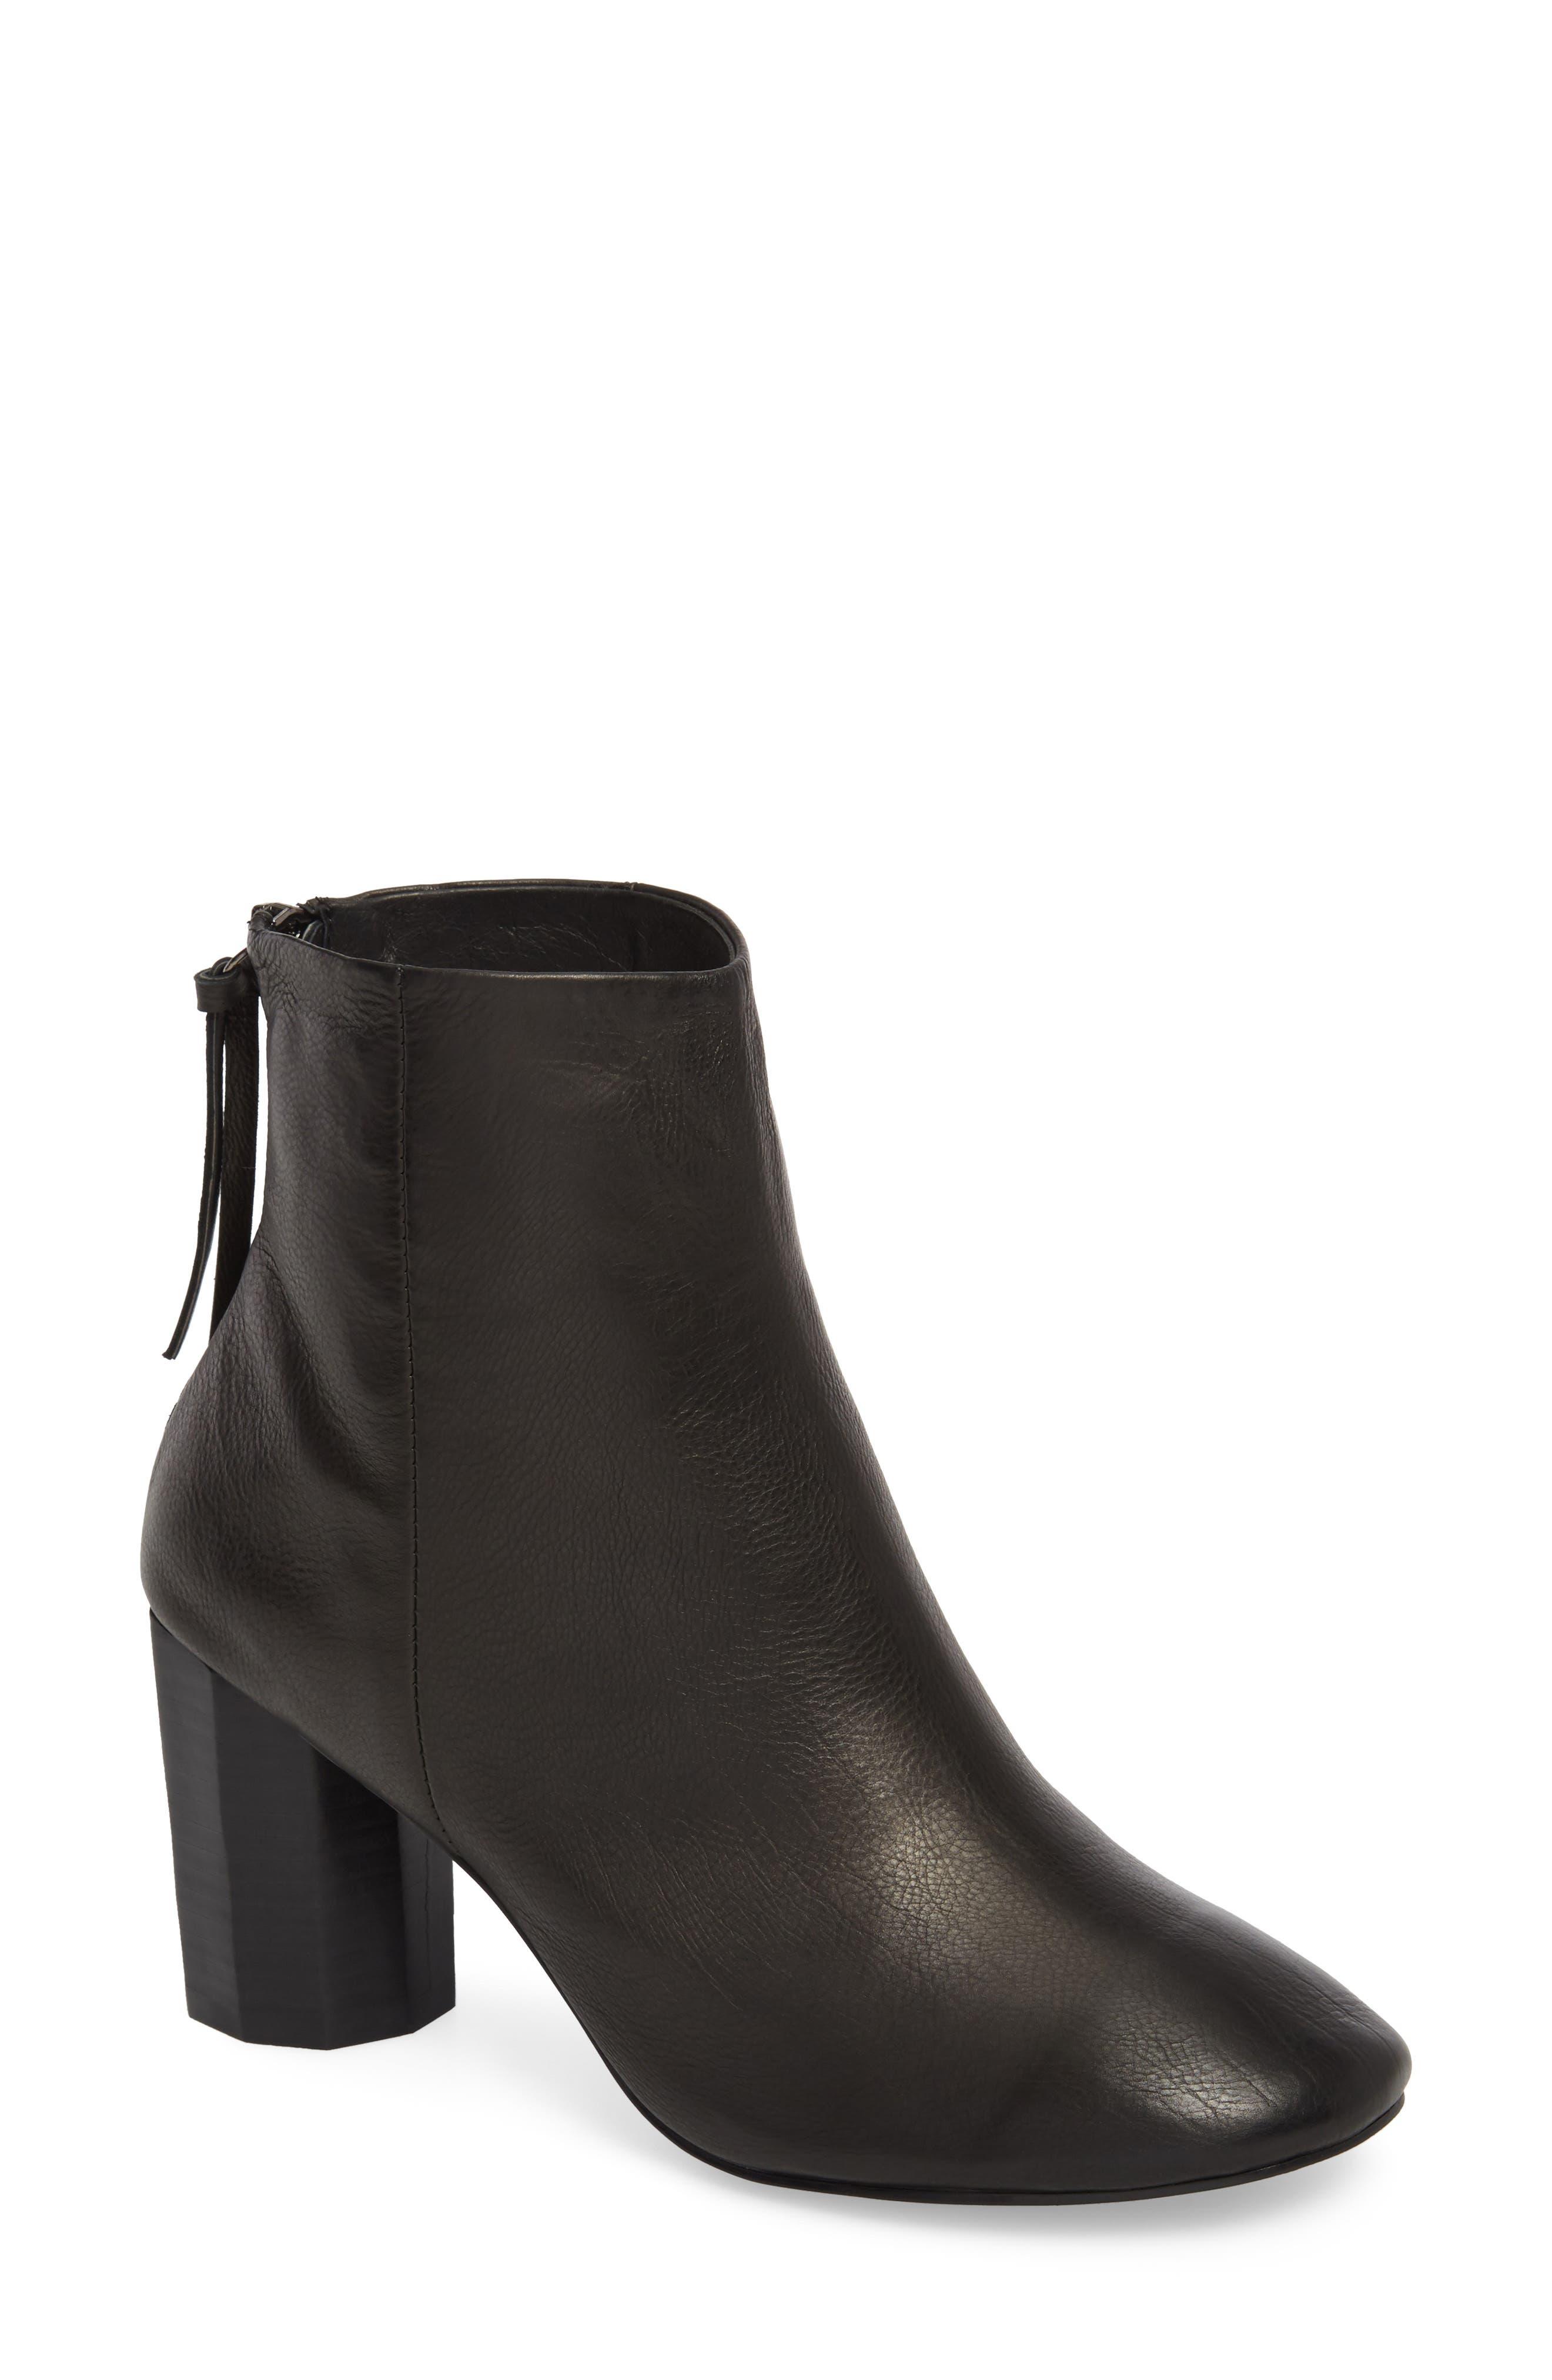 Sadie Column Heel Bootie,                         Main,                         color, Black Leather